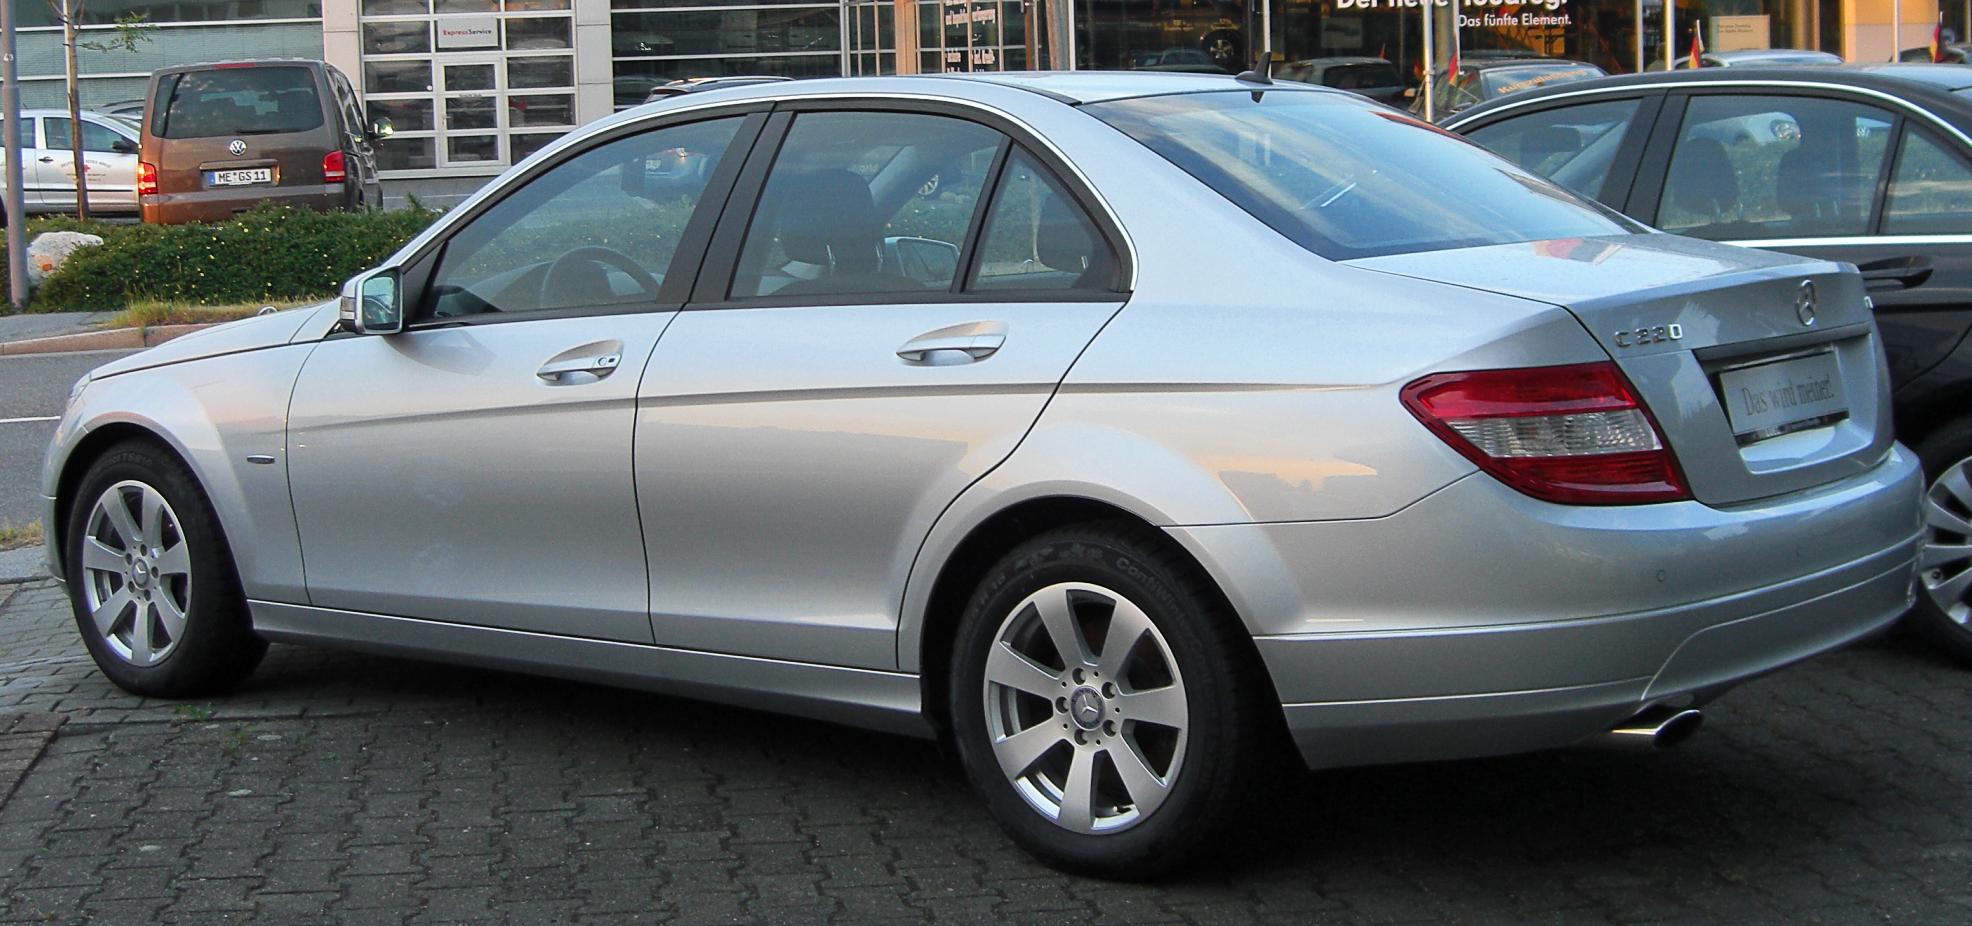 File:Mercedes C 200 CDI BlueEFFICIENCY Classic (W204) rear ...